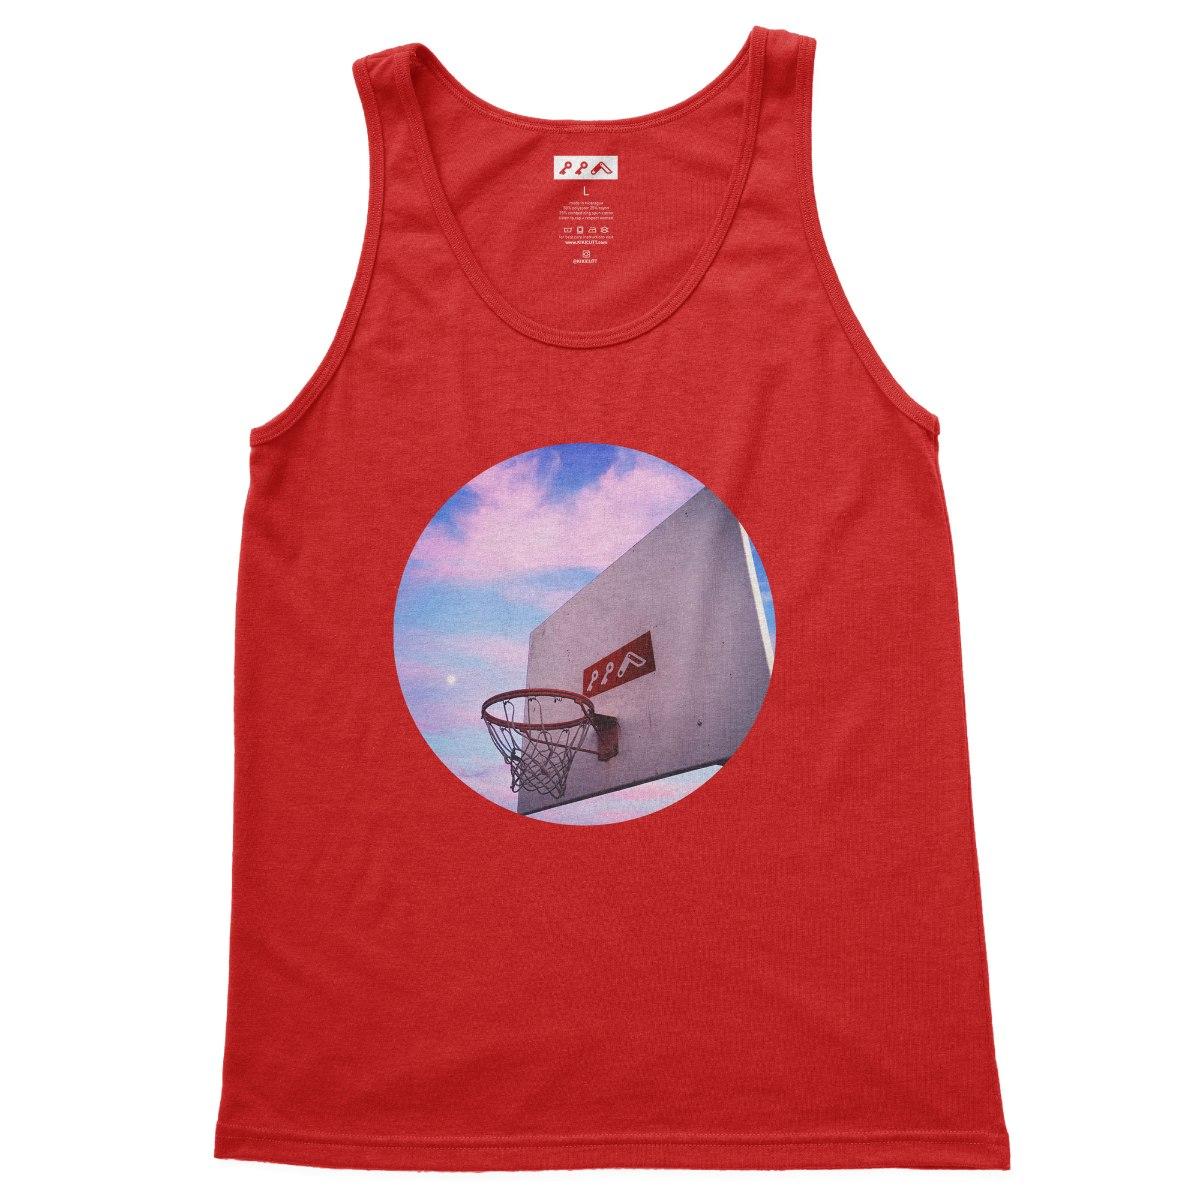 """HOOP DREAMS"" soft basketball tank tops in red tri-blend by kikicutt"